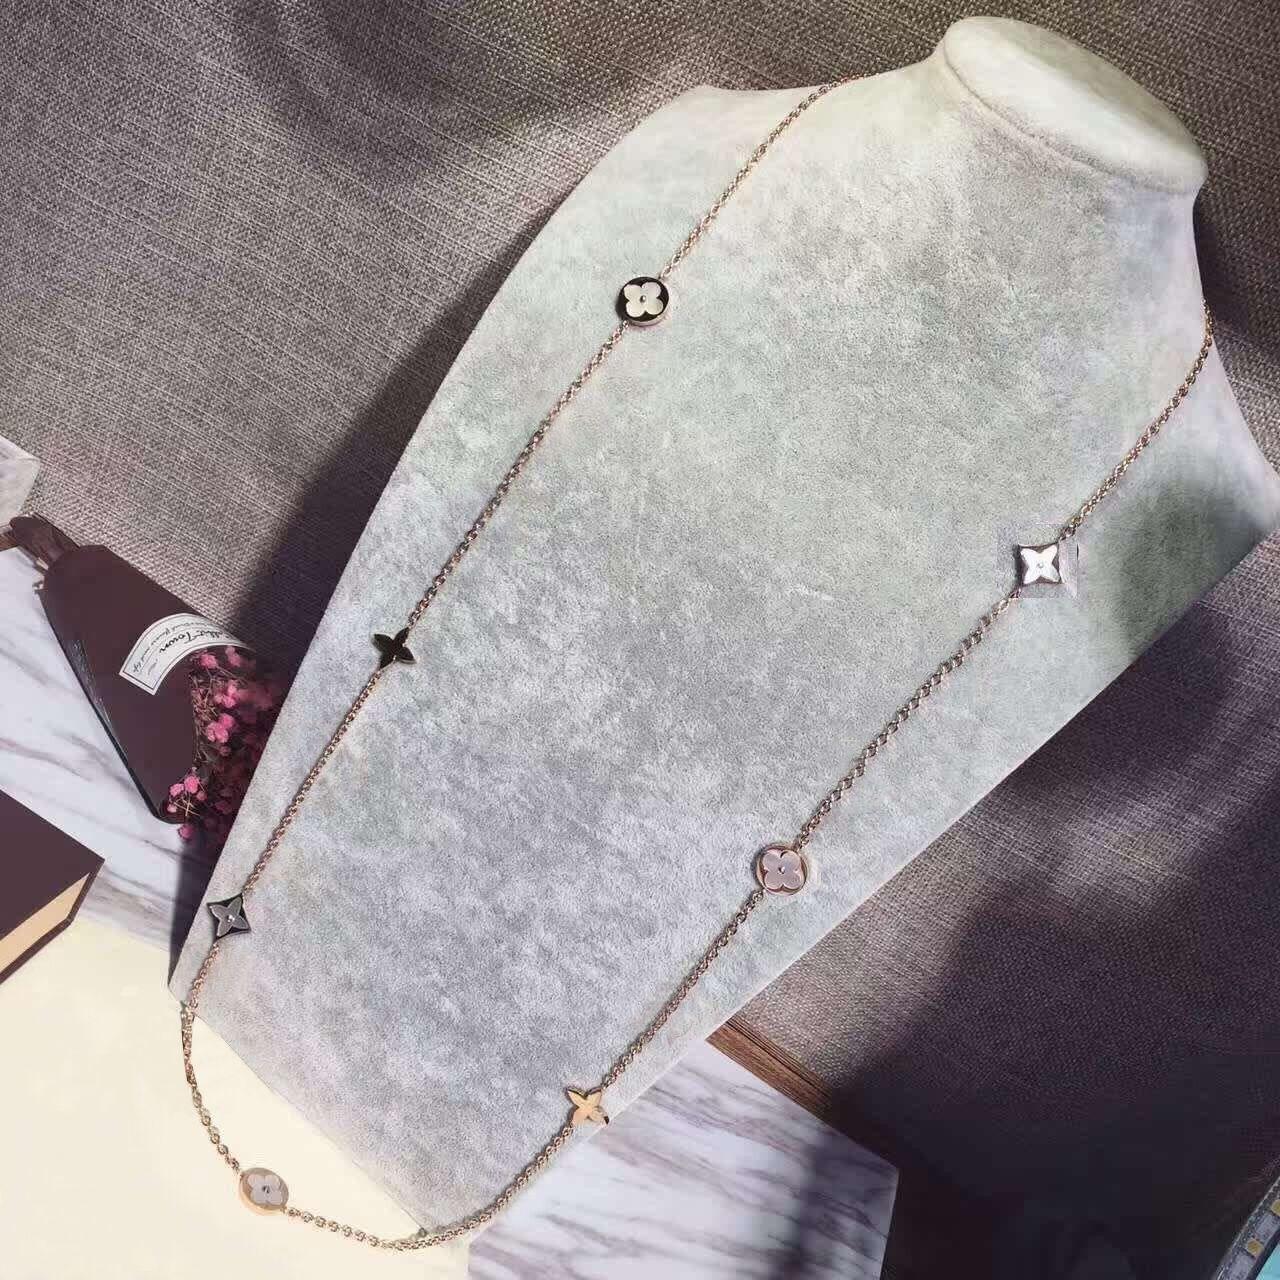 Steel f sweater fashion black female clover colorfast accessories thick medium long pendant Korean chain necklace titanium